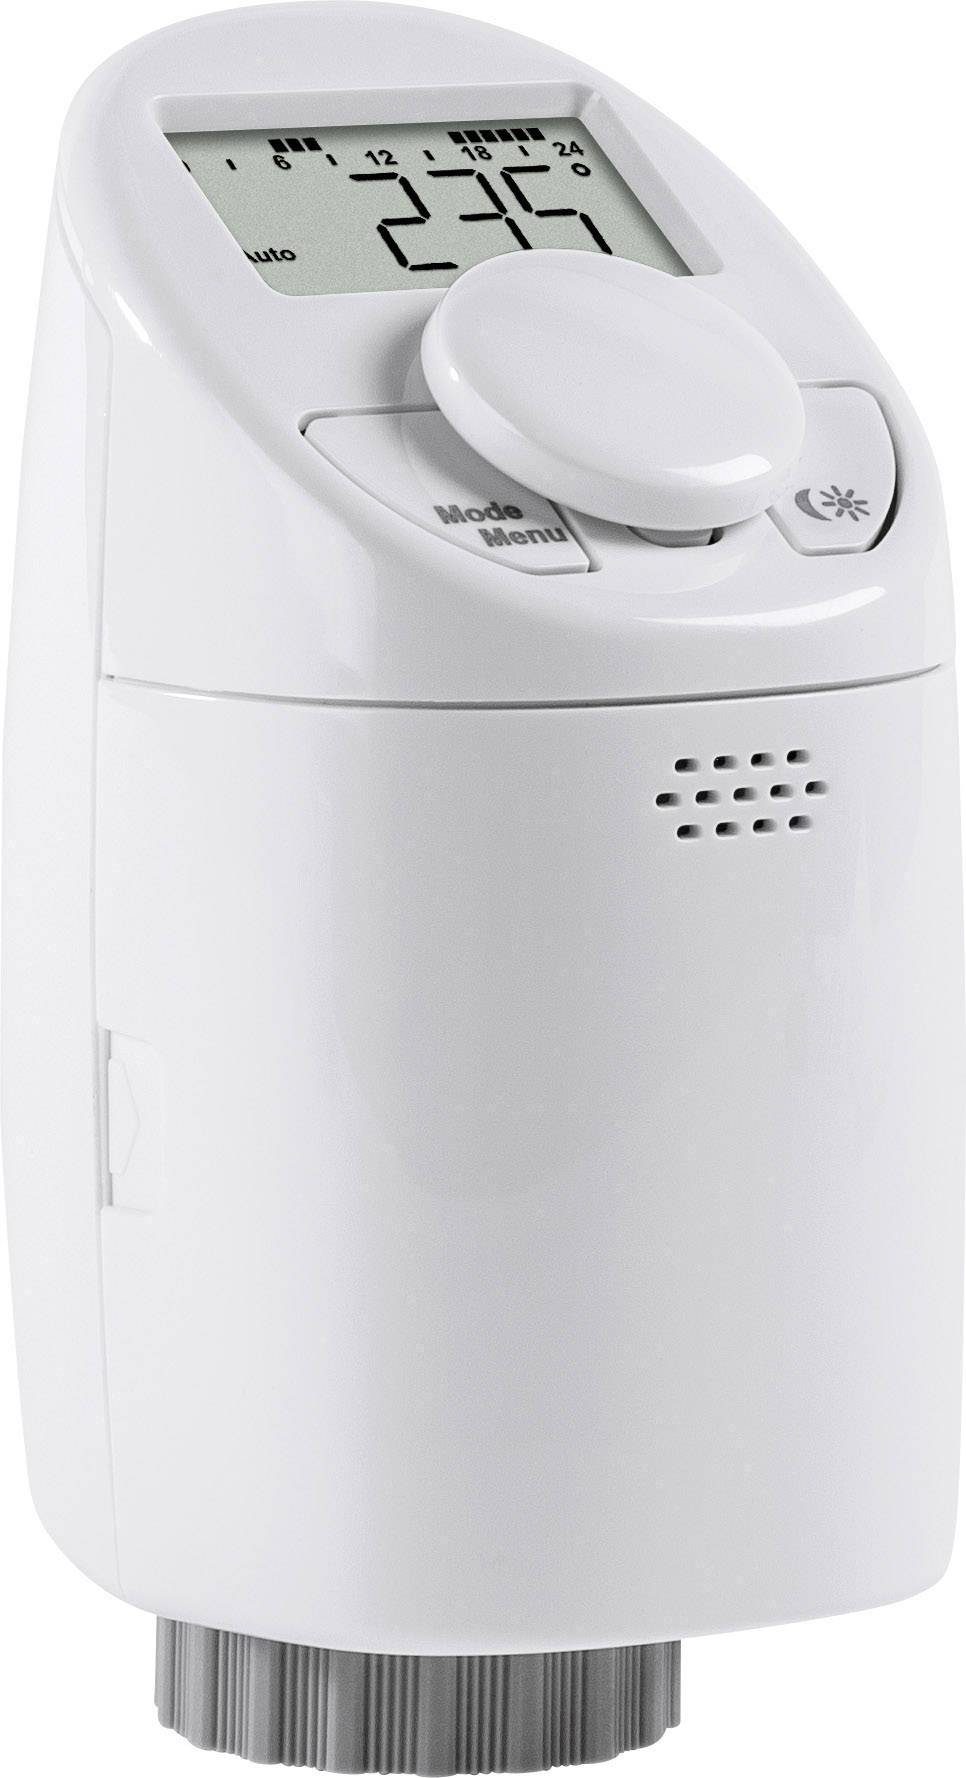 Programovatelná termostatická hlavice eQ-3 CC-RT-M, 5 až 29.5 °C, otočený displej